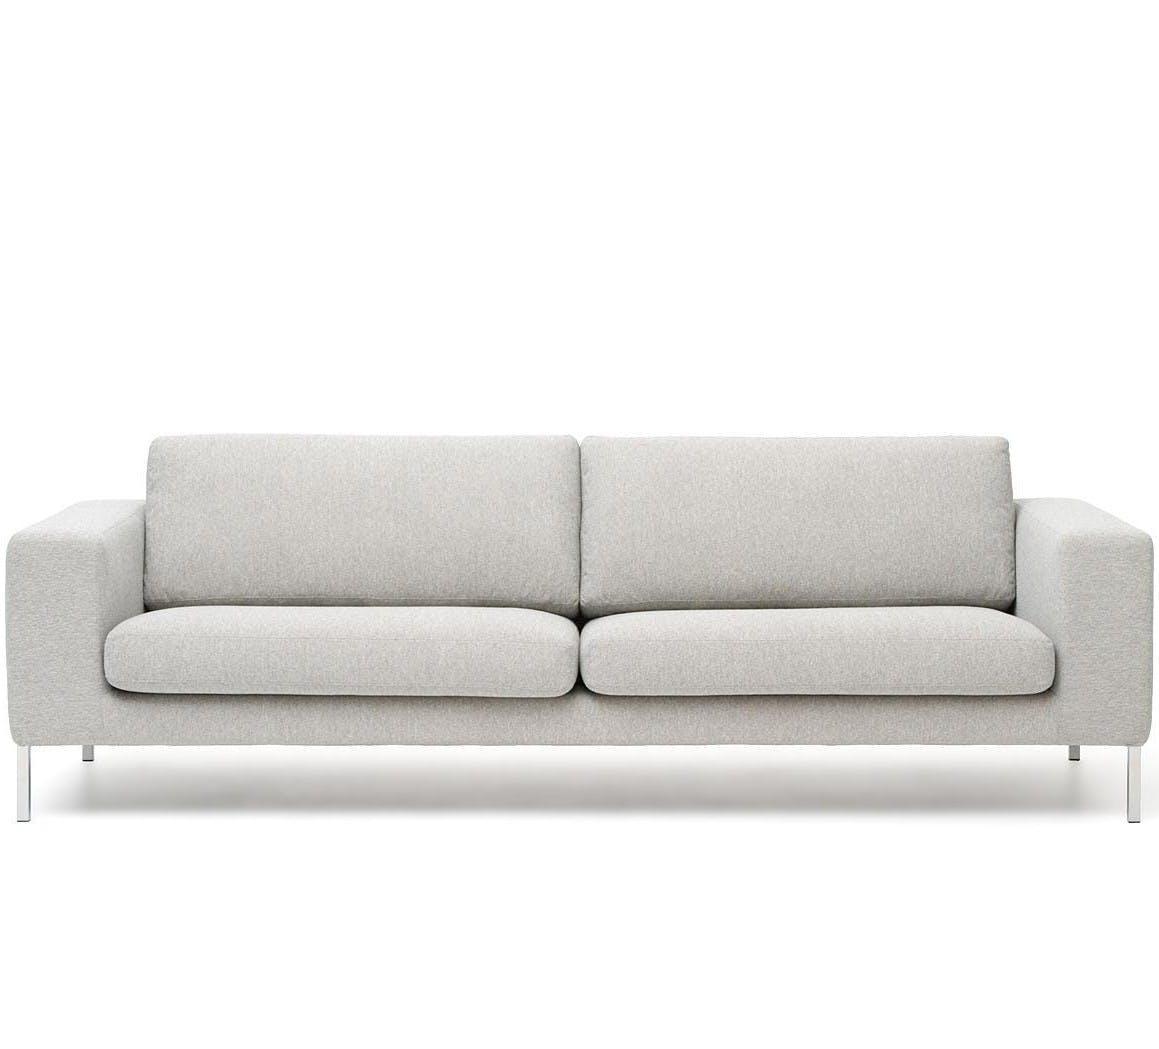 Bensen Neo Sofa Front